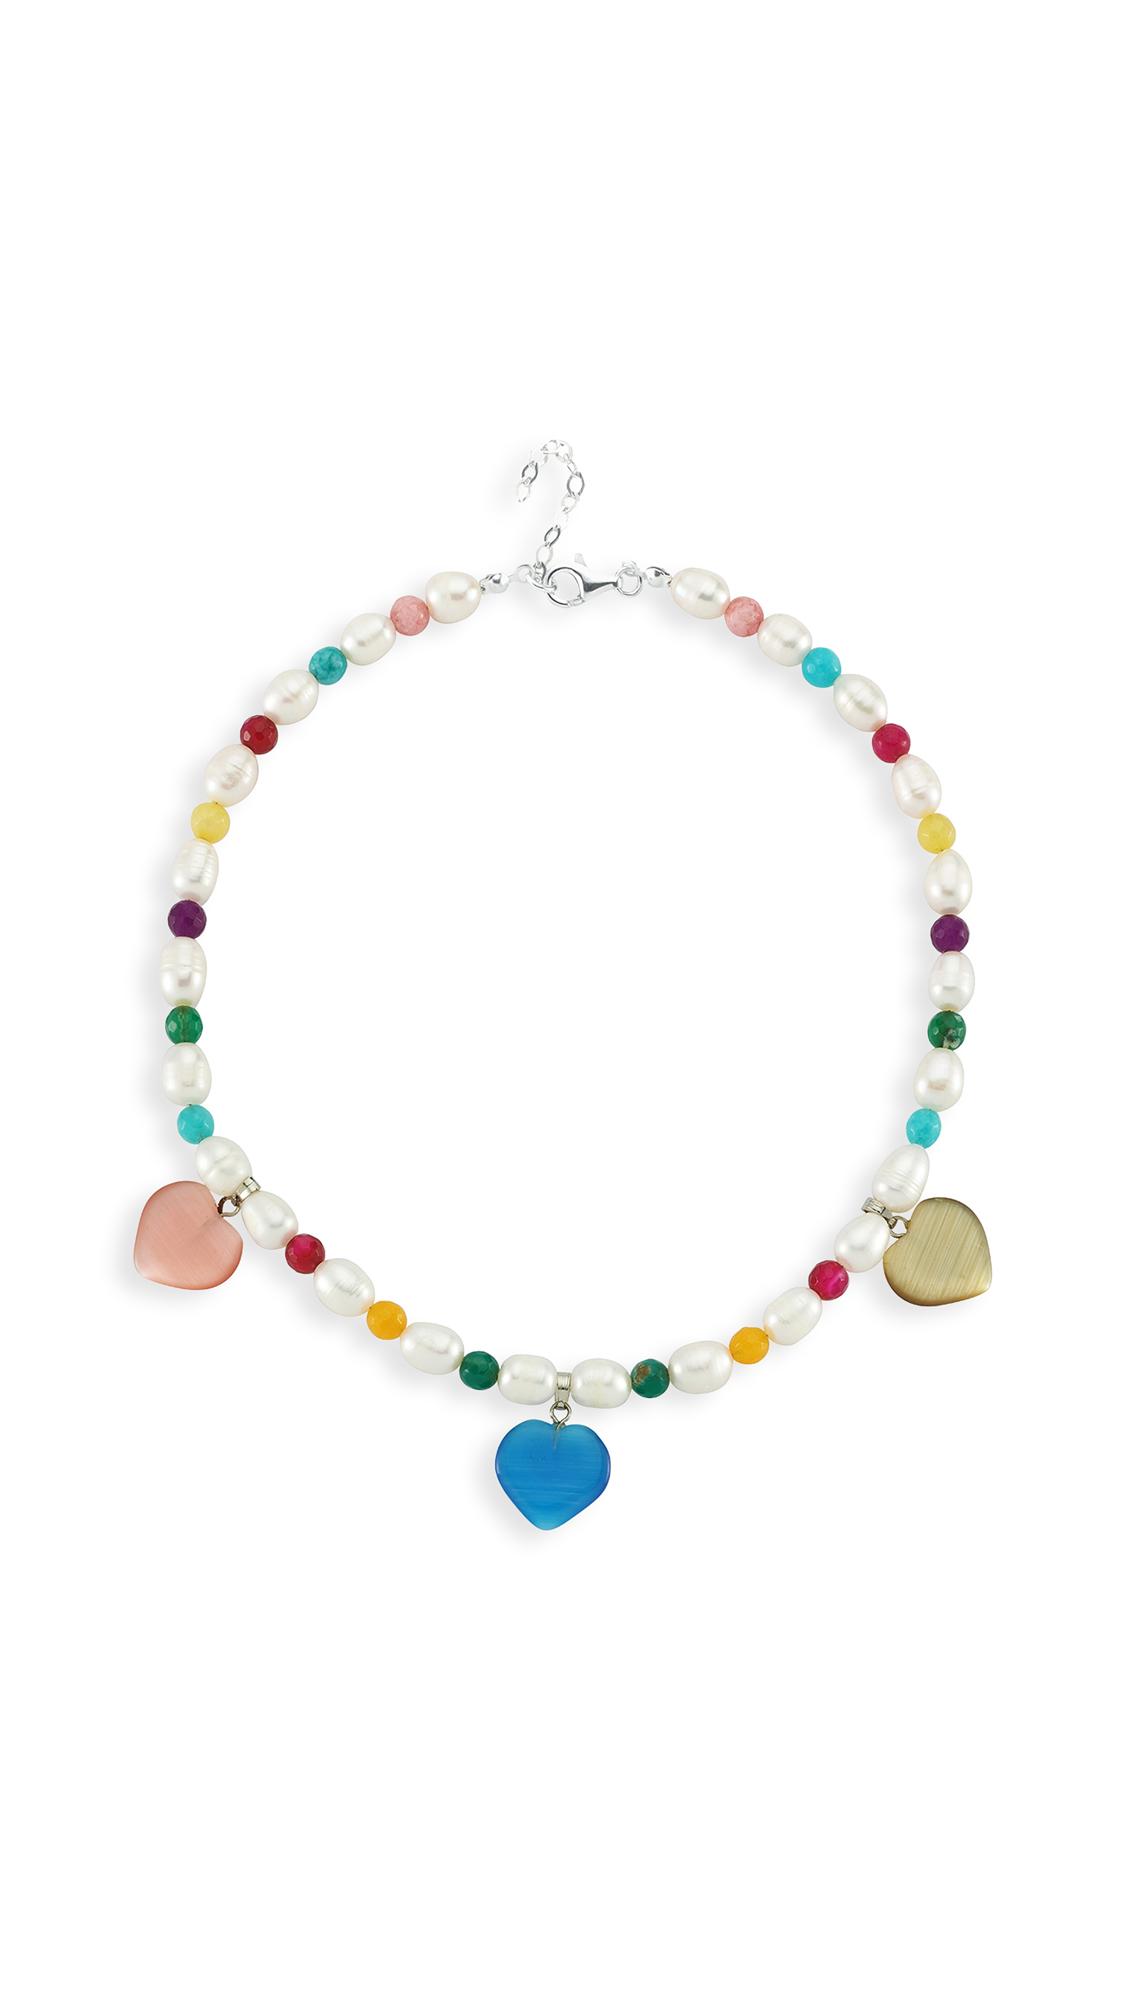 Maison Irem Pearl Rainbow Necklace